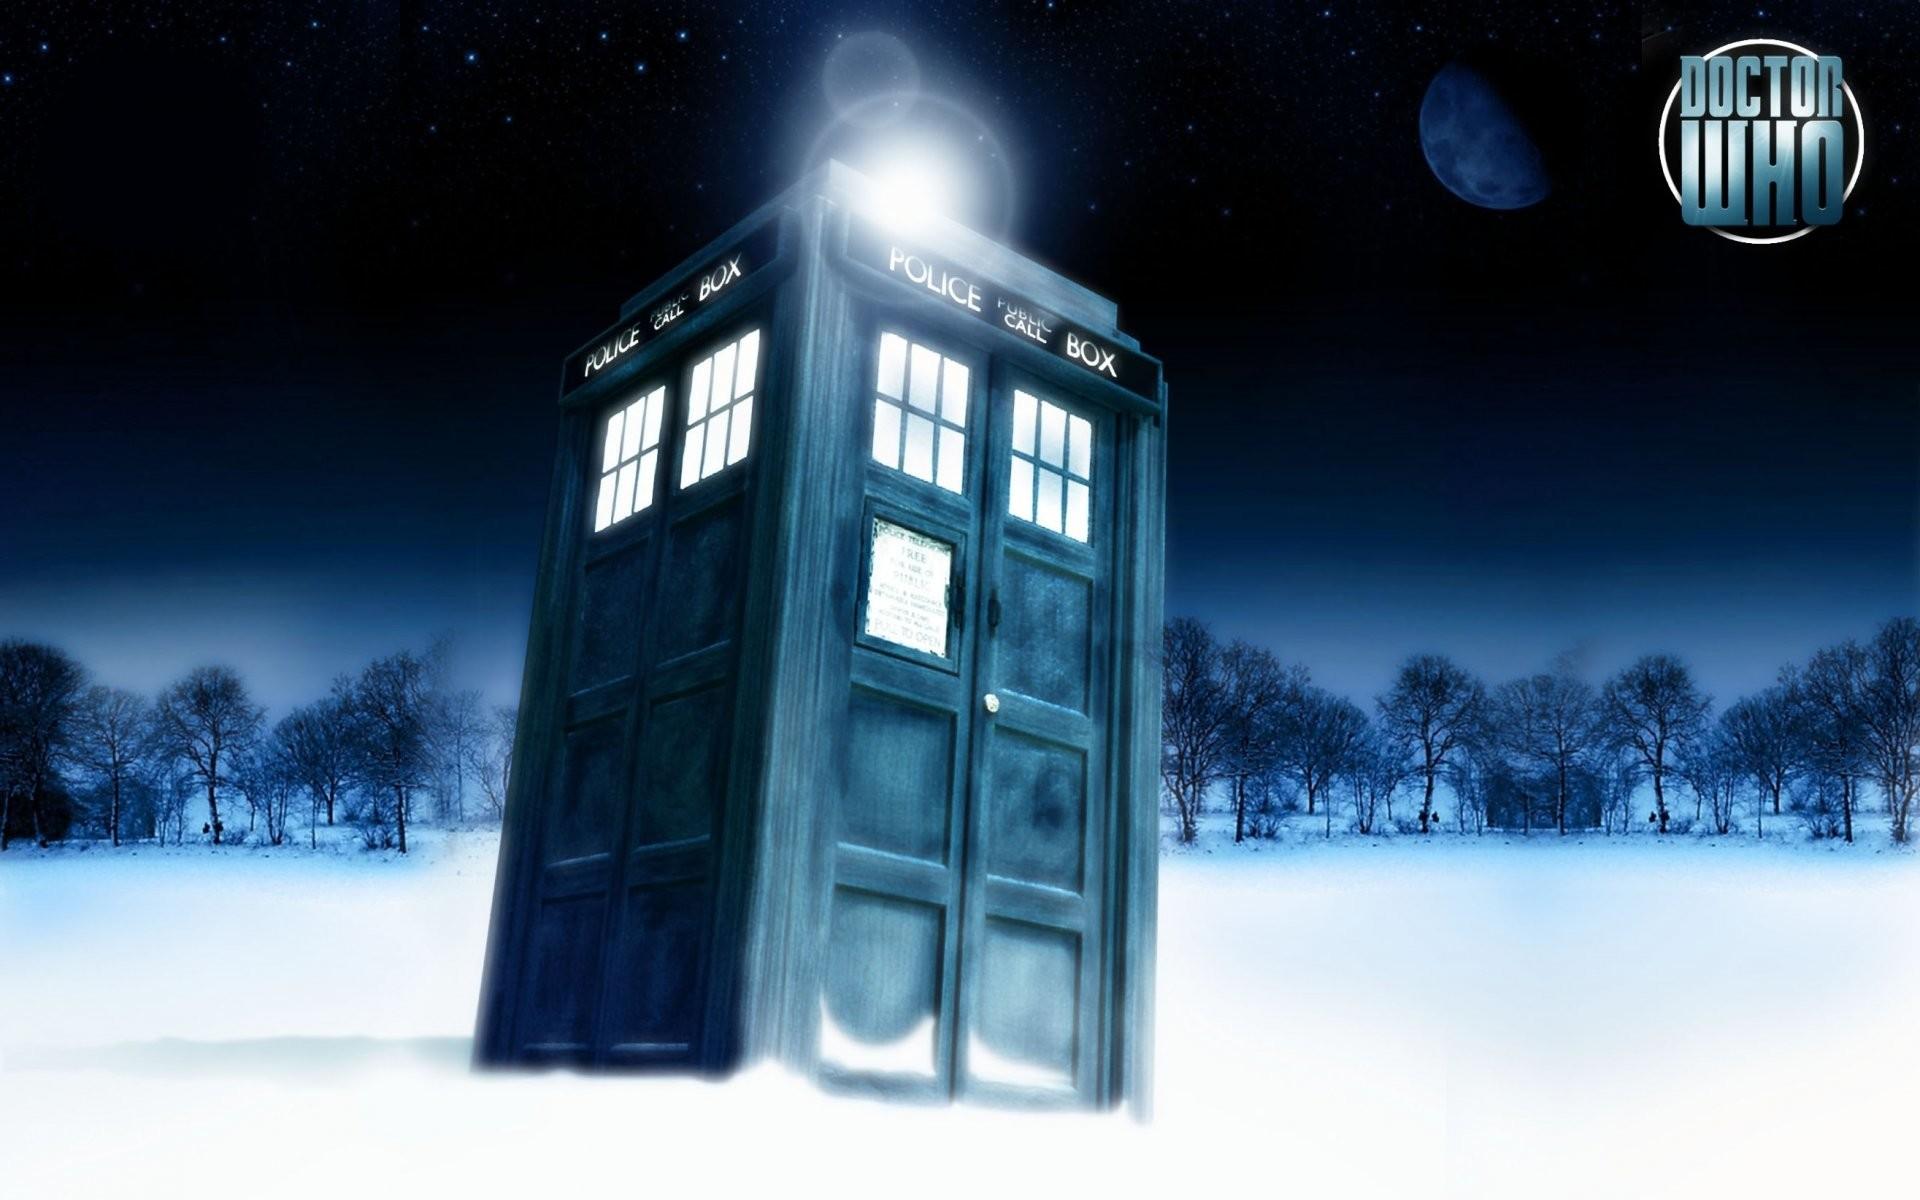 130 Doctor Who Tardis Desktop